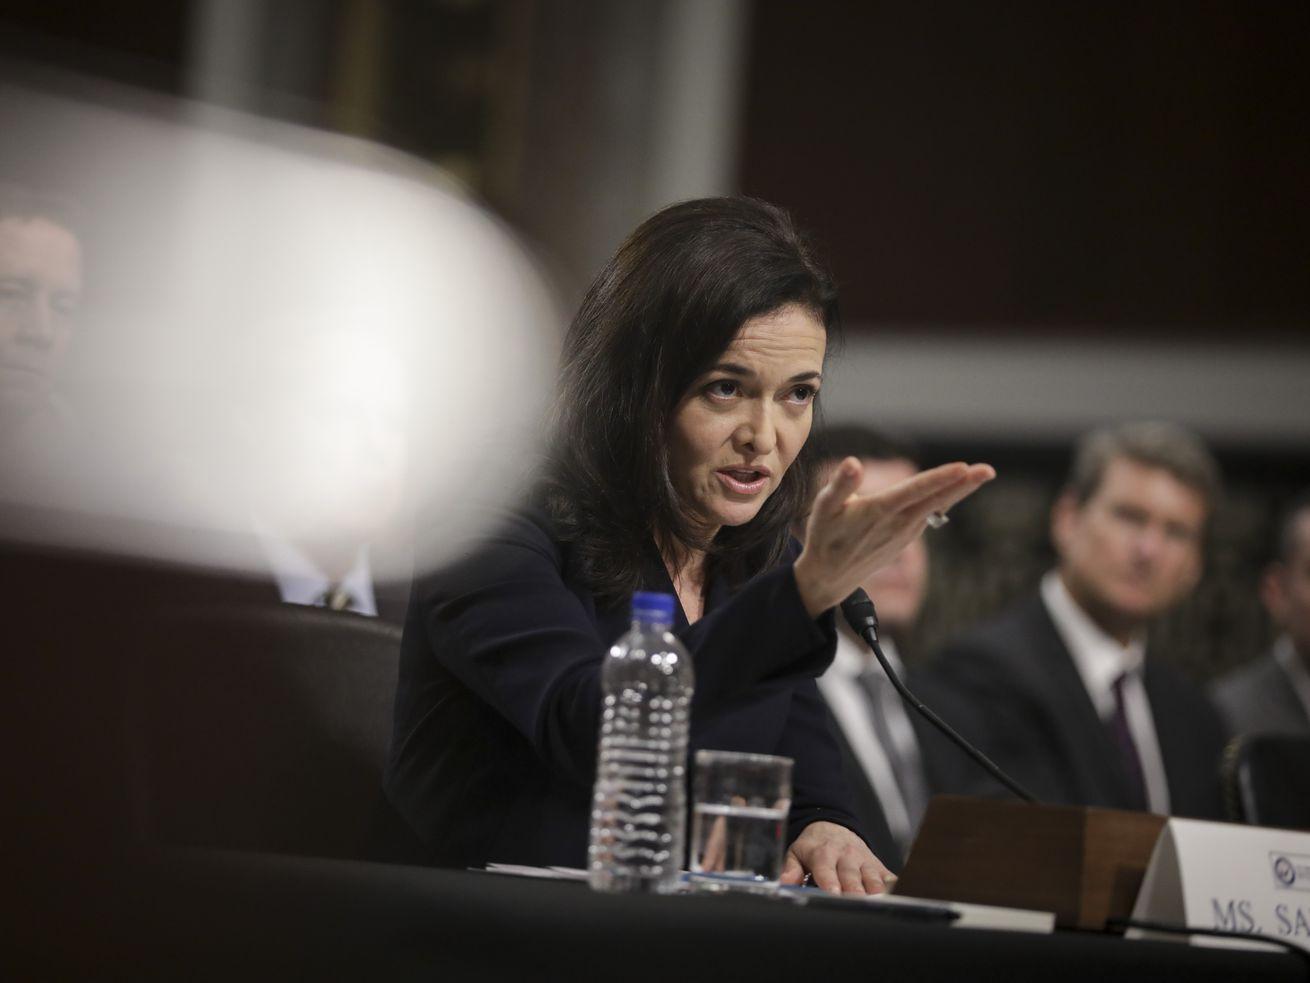 Facebook首席运营官谢乐尔•桑德伯格(Sheryl Sandberg